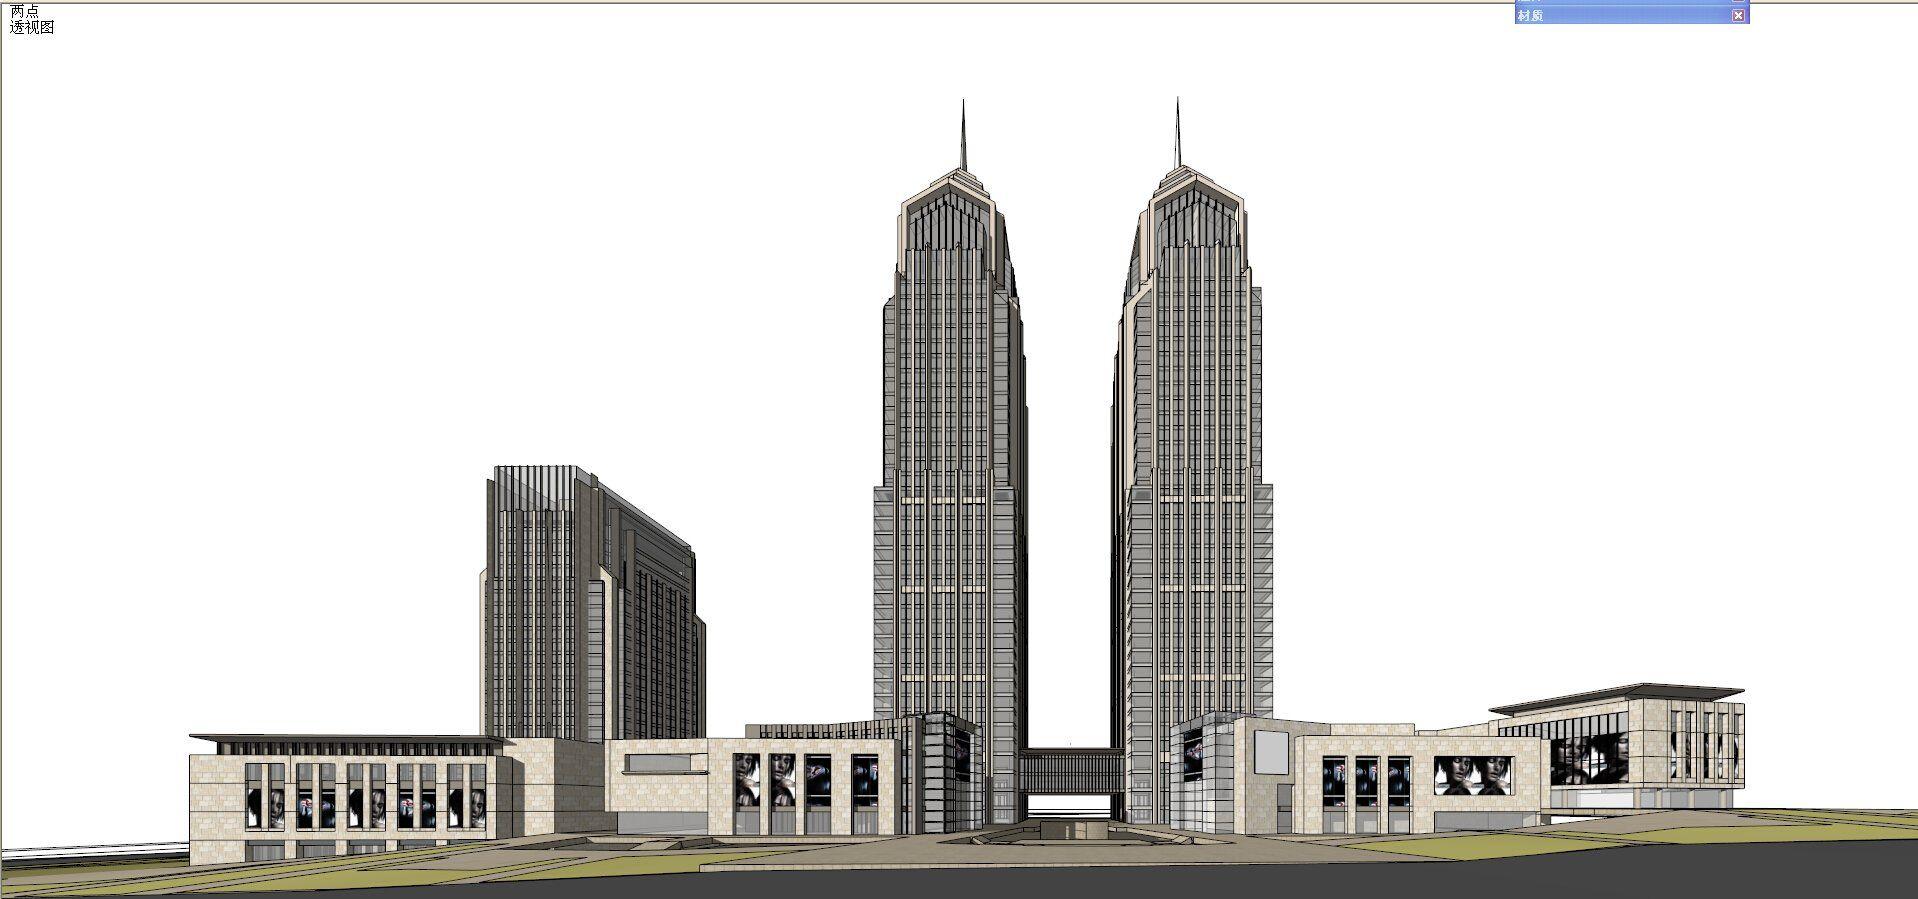 Sketchup 3d Models Skyscraper Sketchup Model Sketchup Model 3d Design Software 3d Model